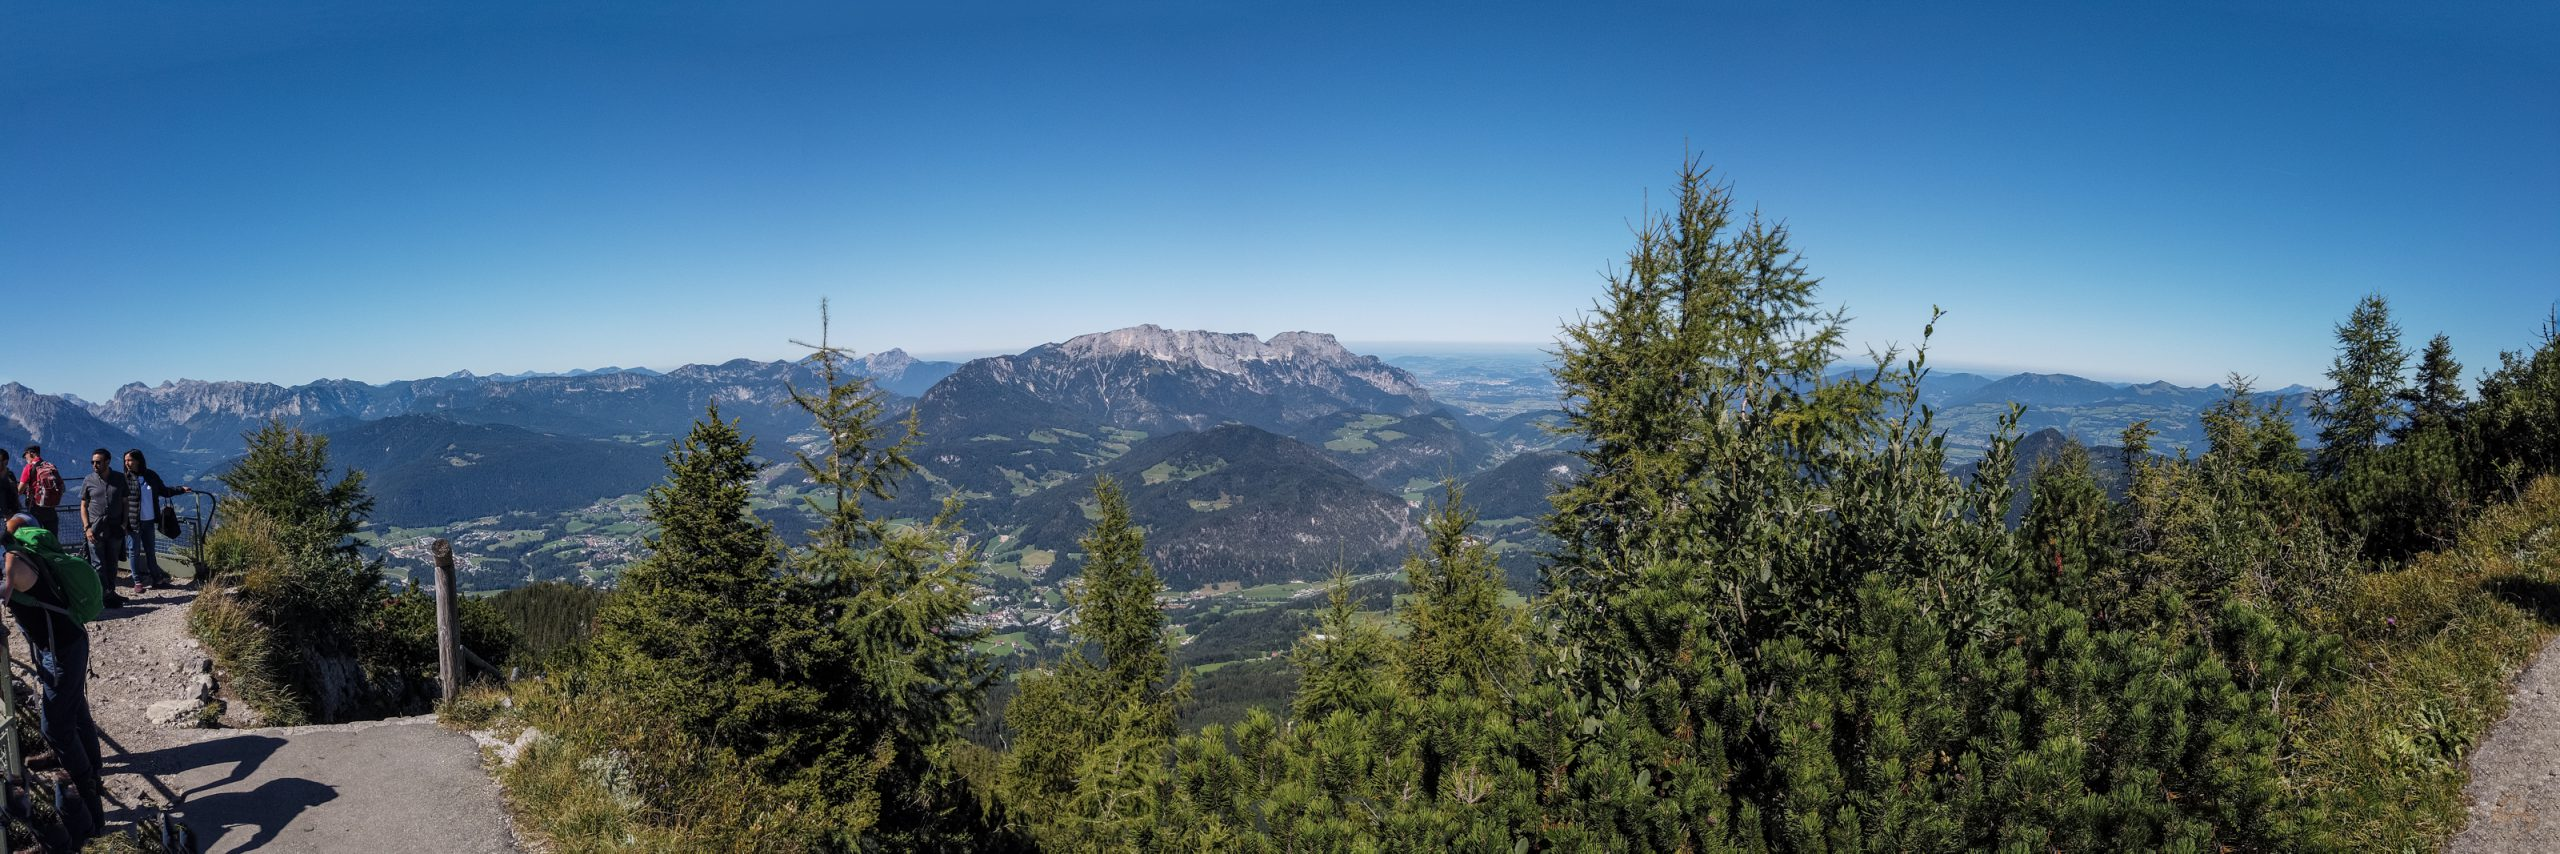 Obersalzberg | Berchtesgaden | Kehlsteinhaus